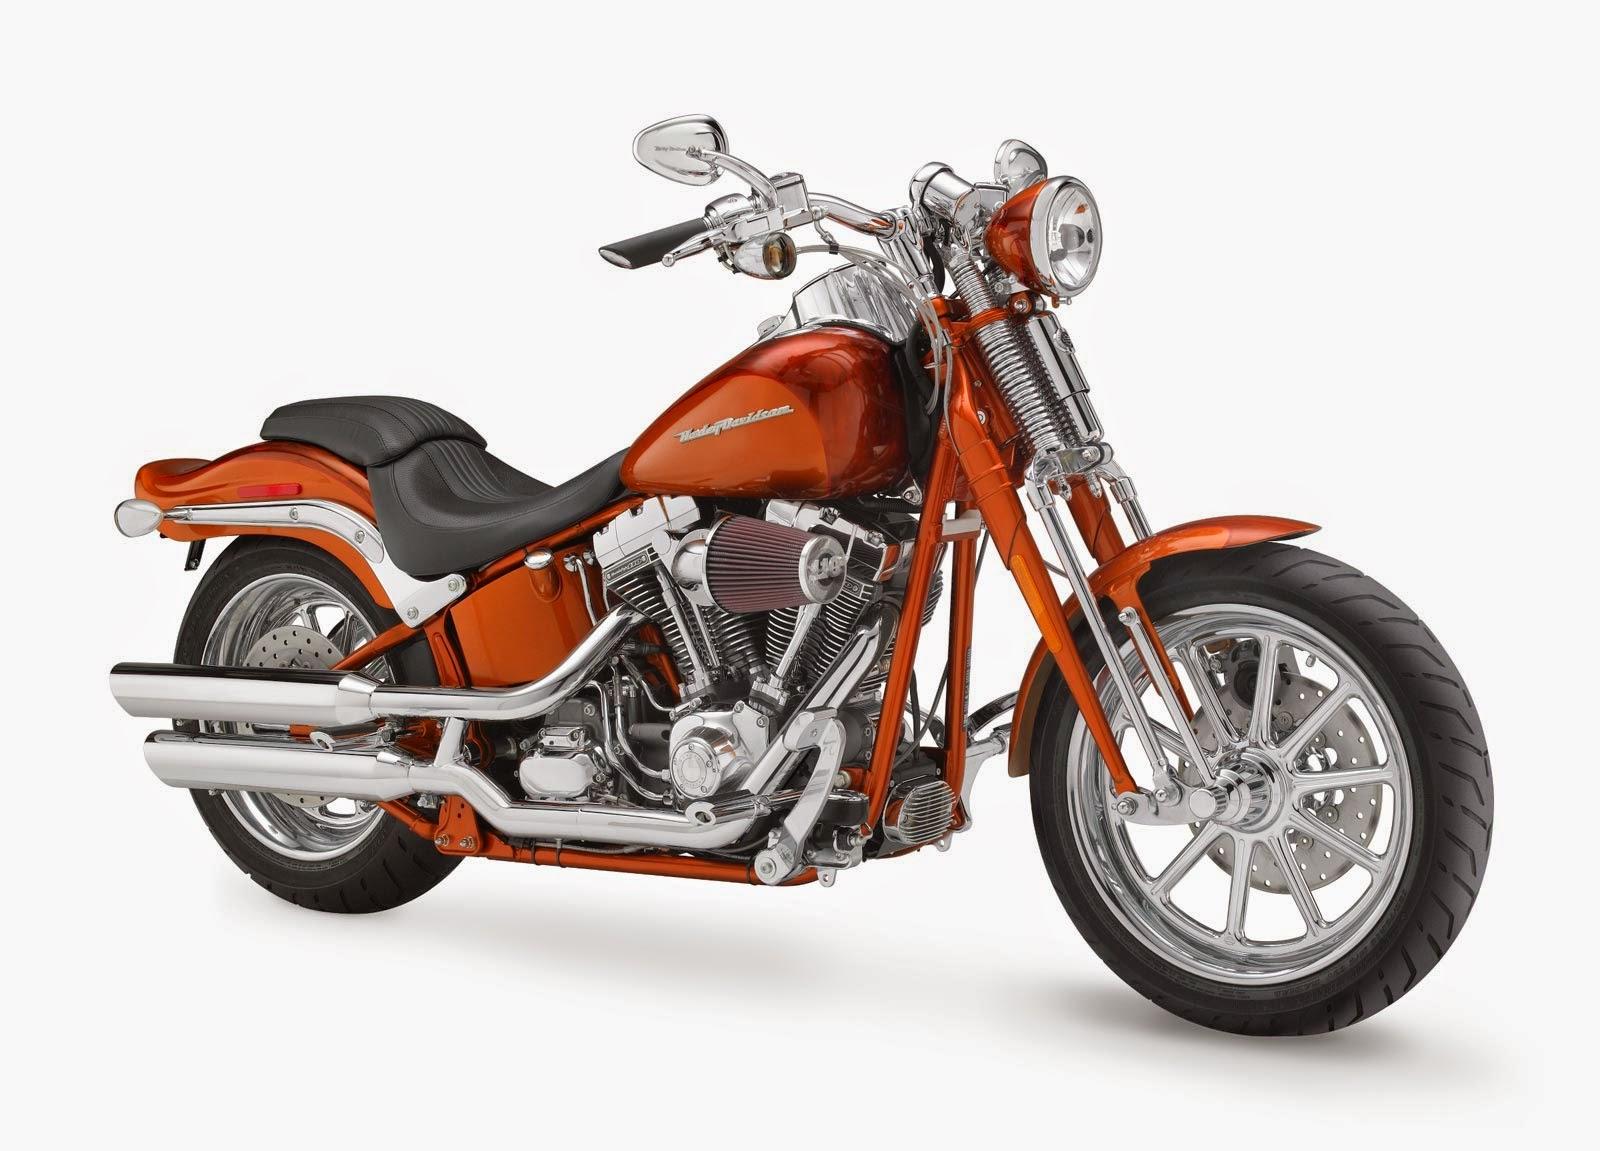 harley davidson cvo softail springer fxstsse2 owner s manual 2008 rh harley manuals cc XL1200L Modified Harley-Davidson XL 1200 Low